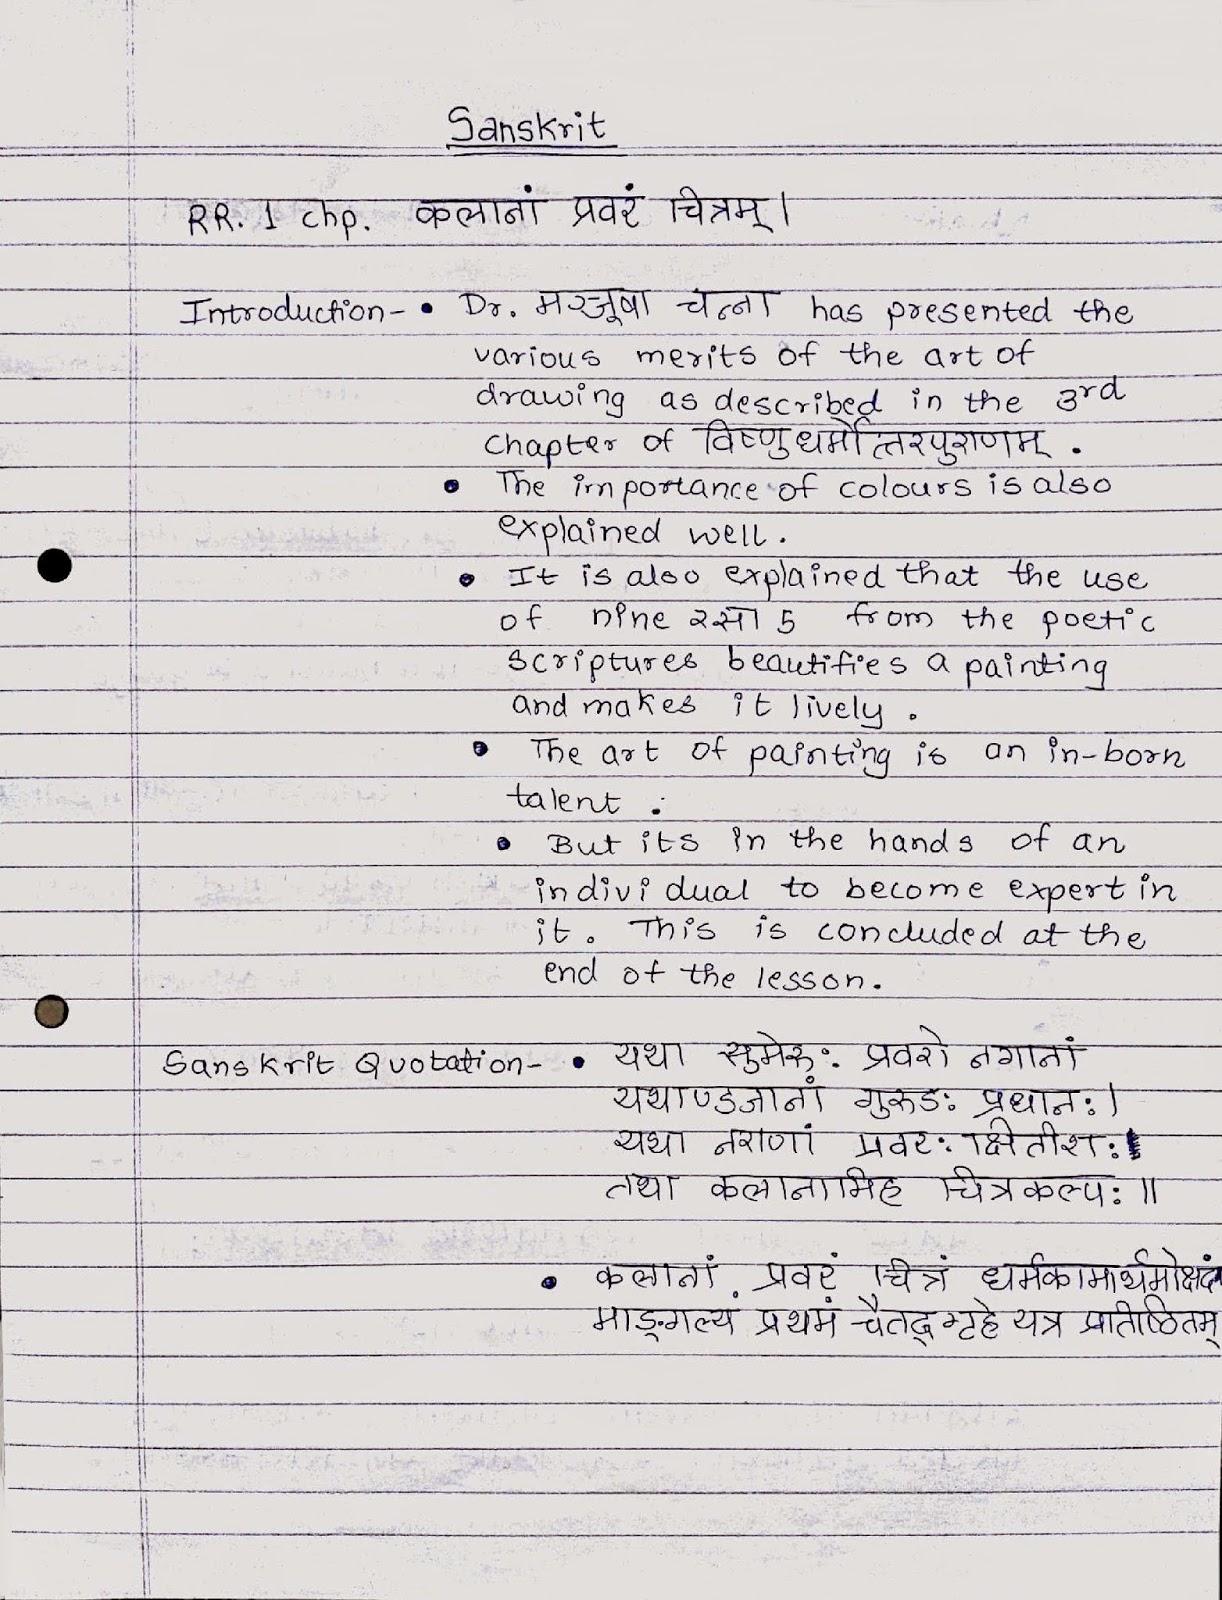 013 Description Of Trees For Essays Essay Example Sanskrit Quotes Poemrr1 Page Striking Full